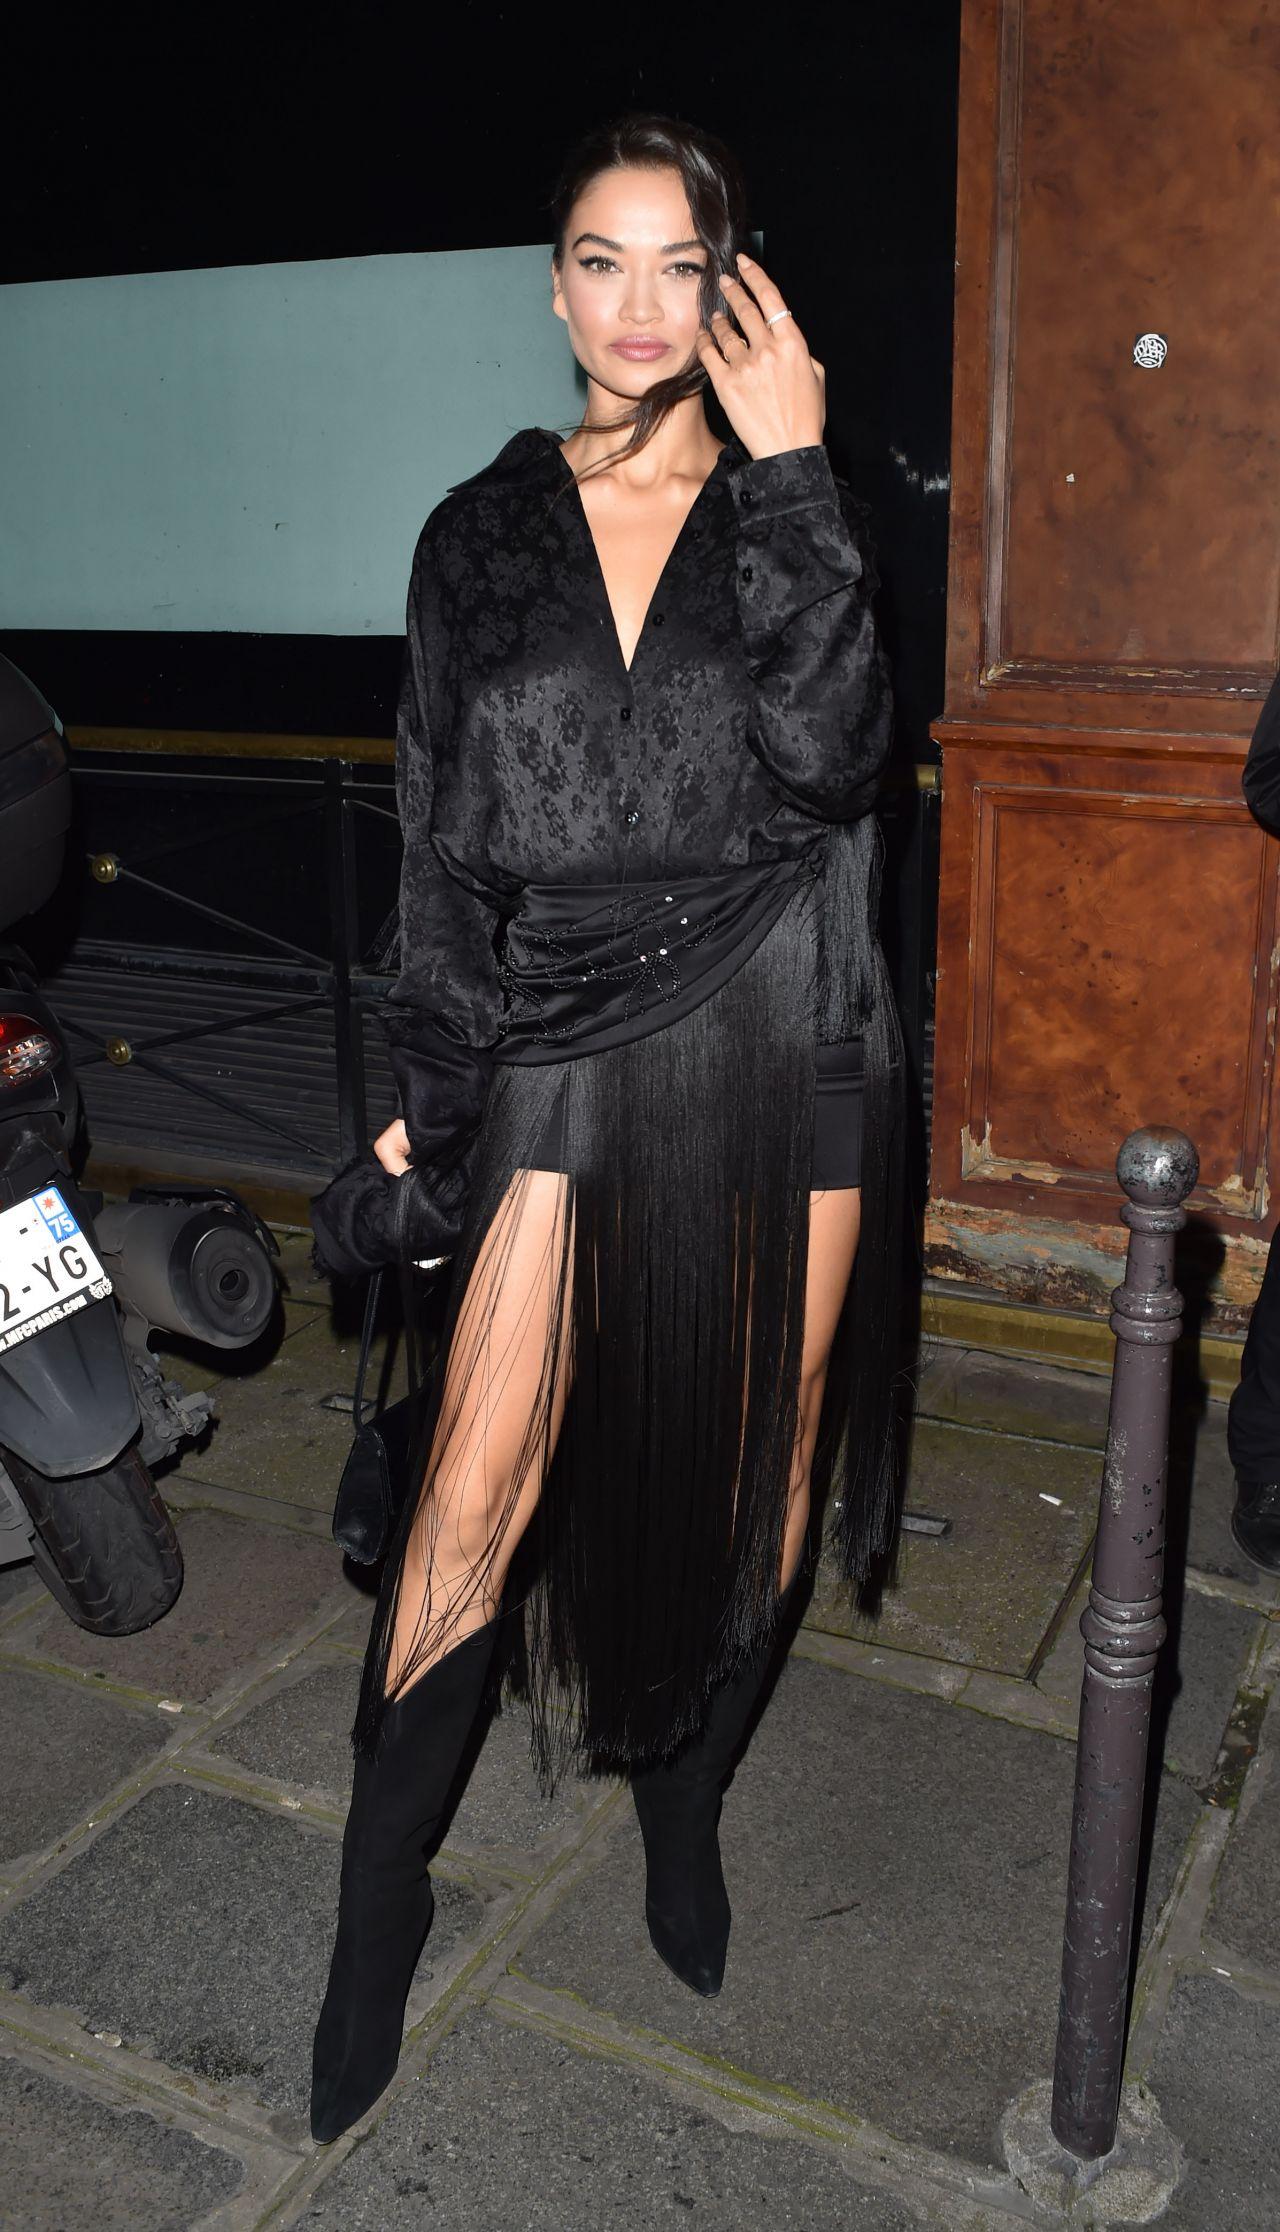 Shanina Shaik Cocktail Party At The Paris Fashion Week 03 03 2019